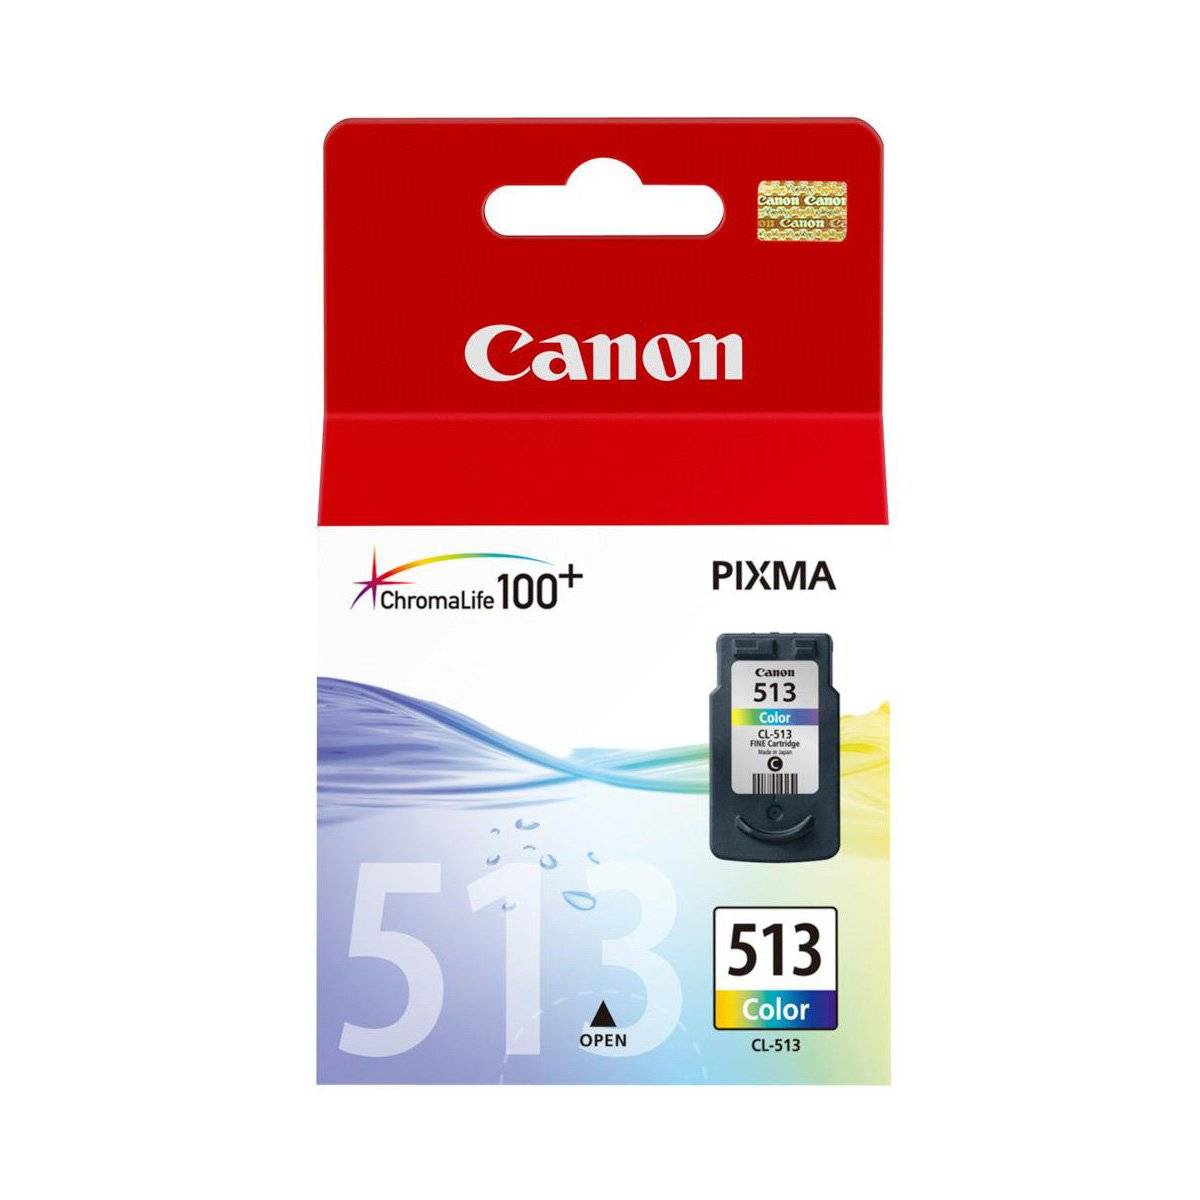 Cartouche Imprimante Canon - 511 Couleur